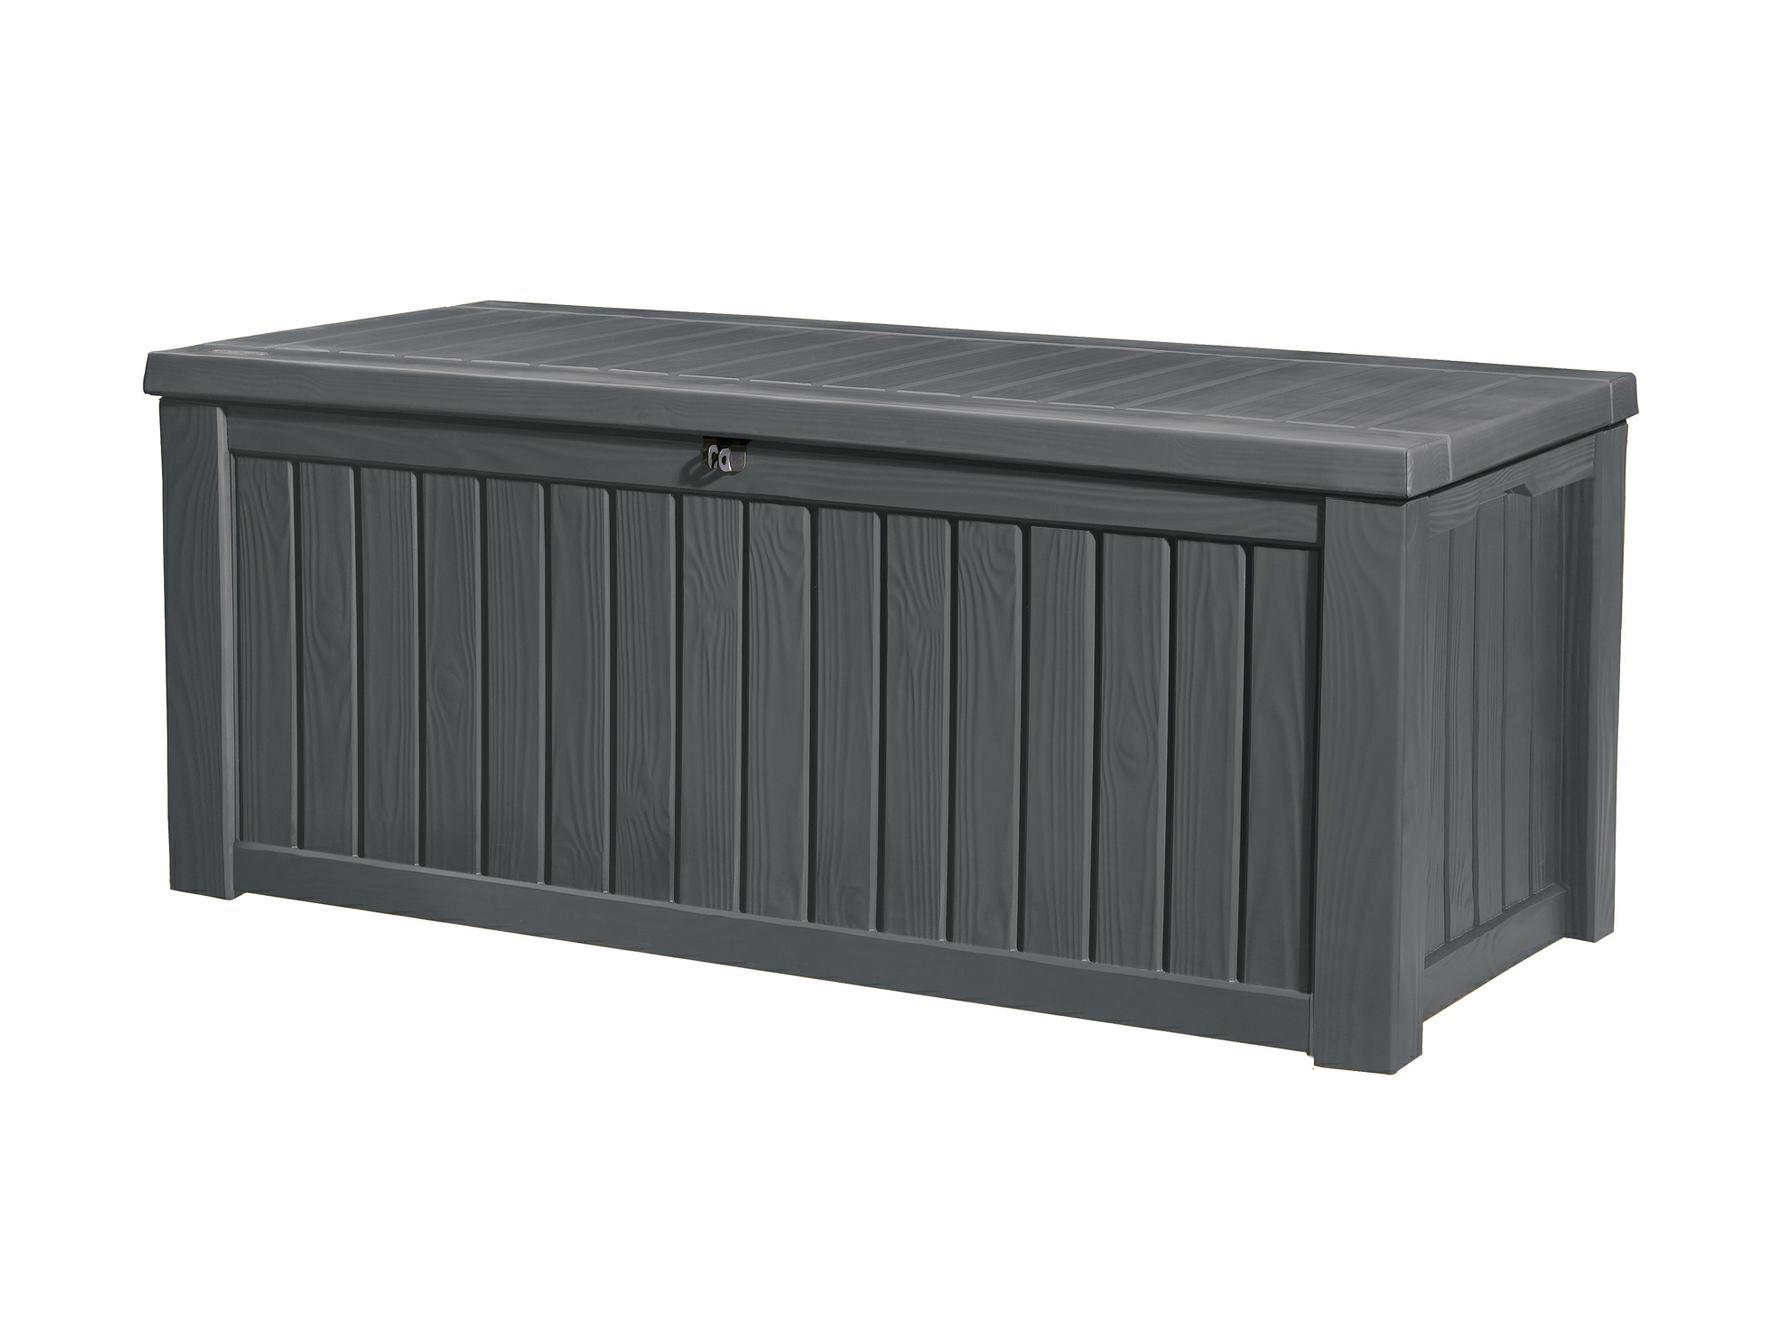 preisvergleich eu gartenbox xxl. Black Bedroom Furniture Sets. Home Design Ideas